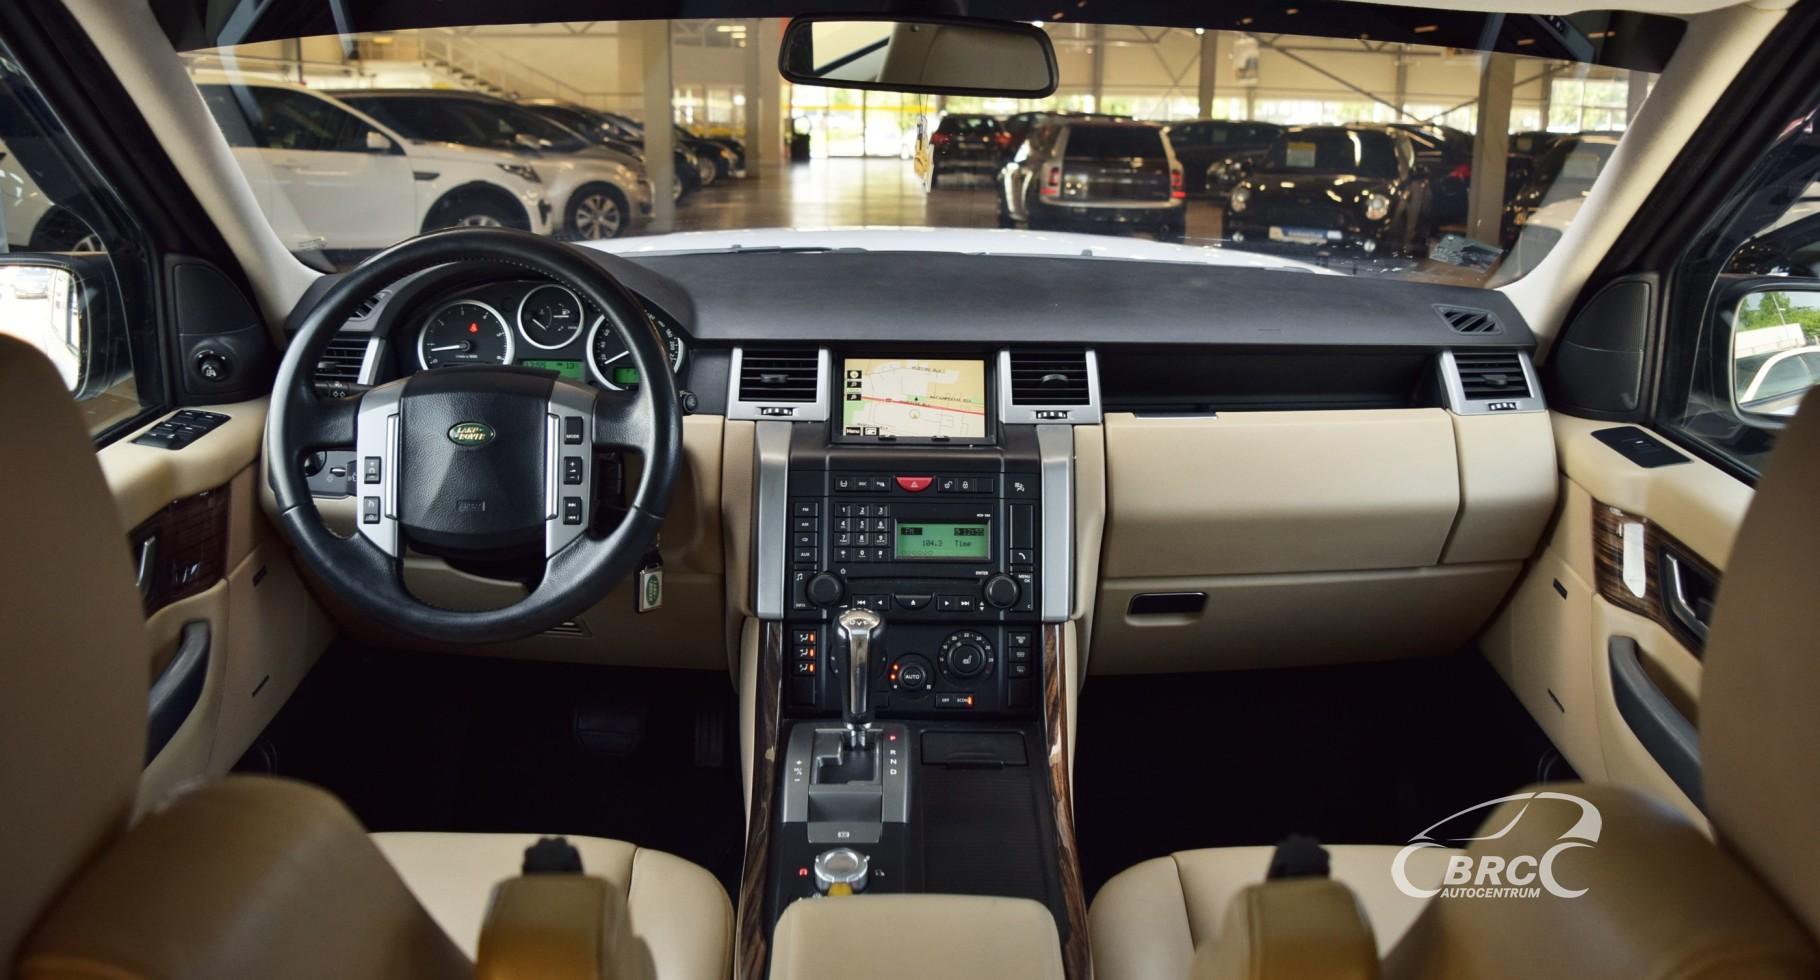 Land-Rover Range Rover Sport TDV8